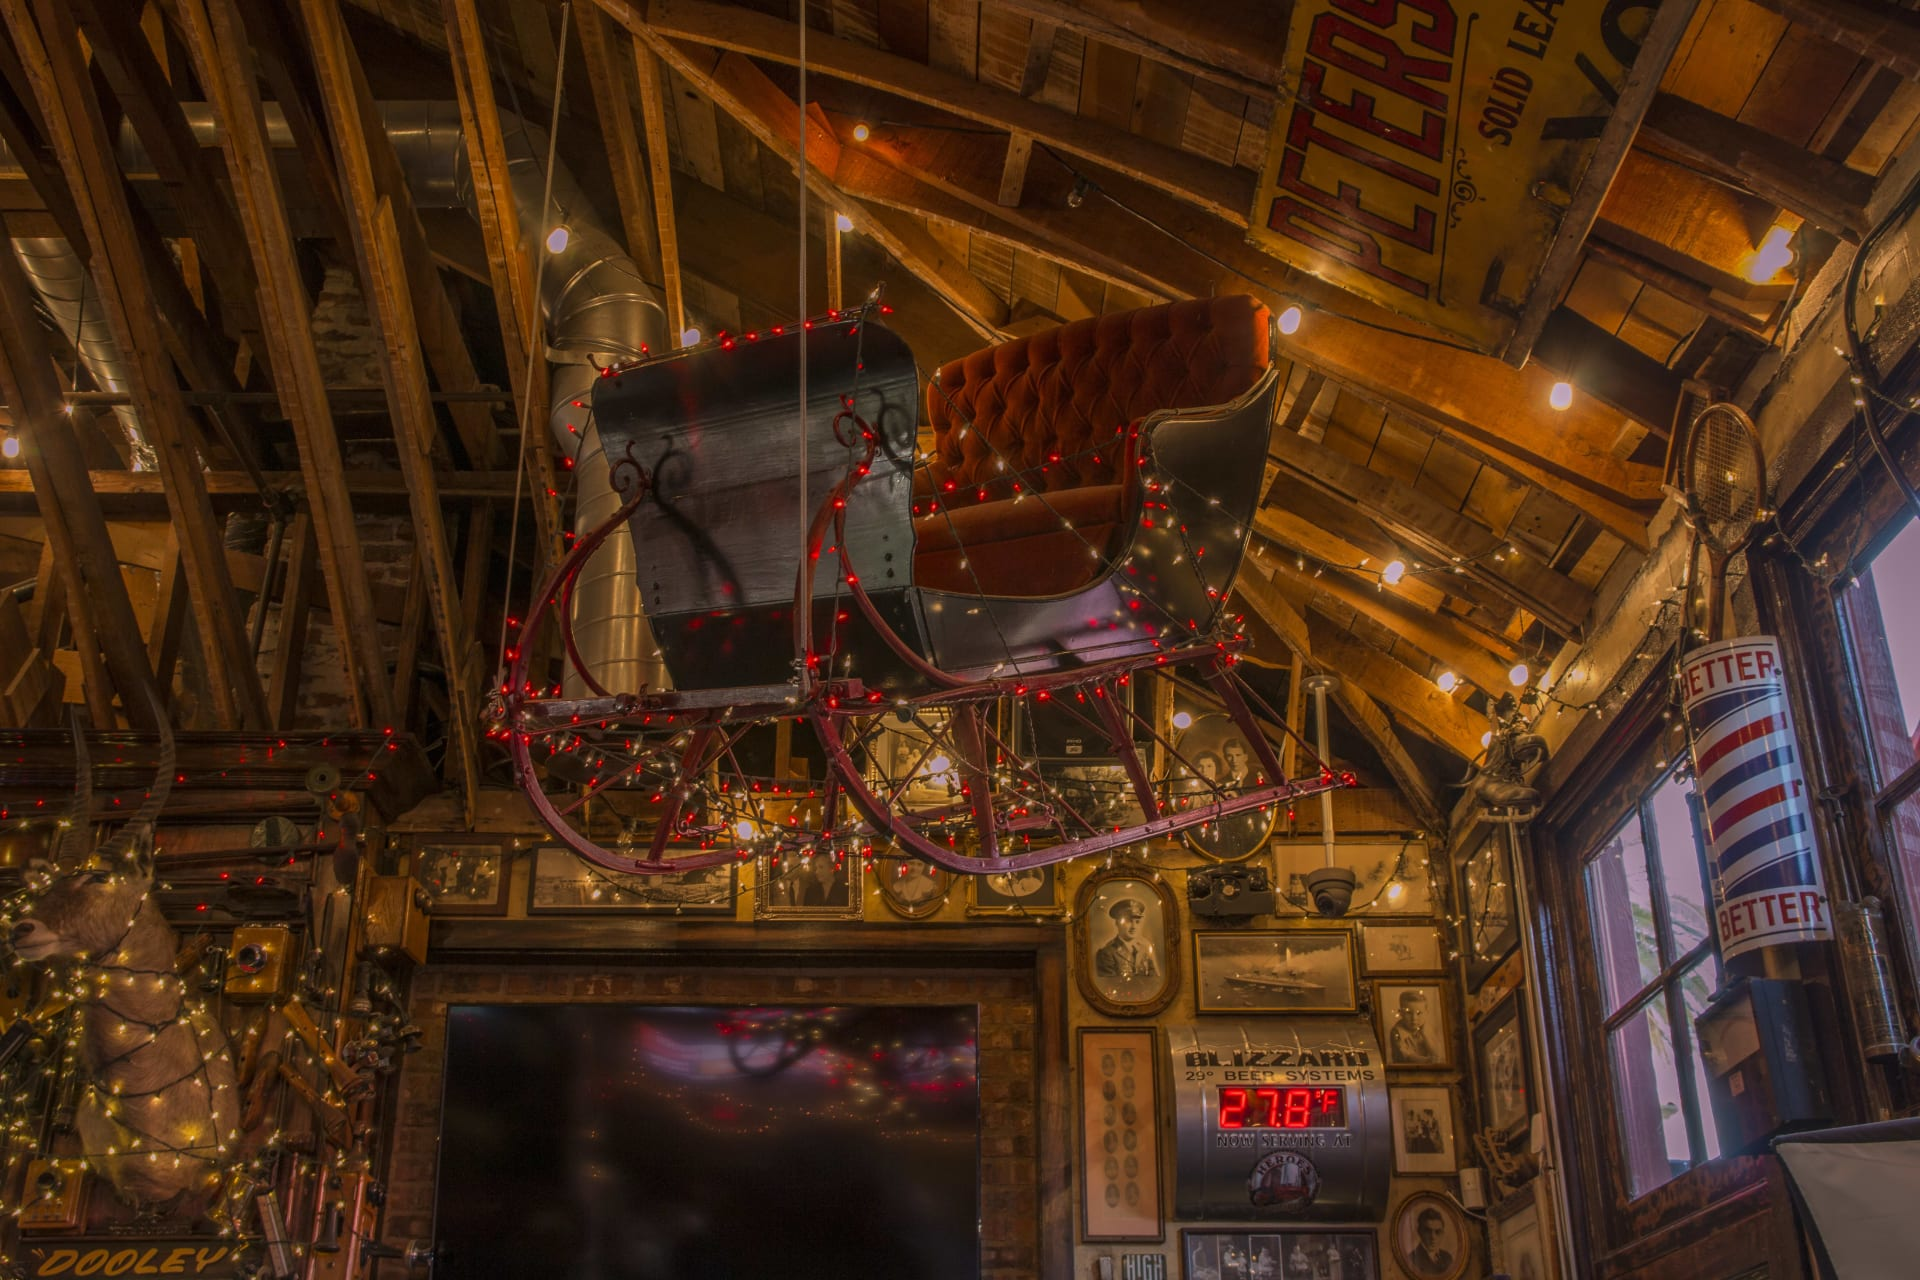 interior sleigh